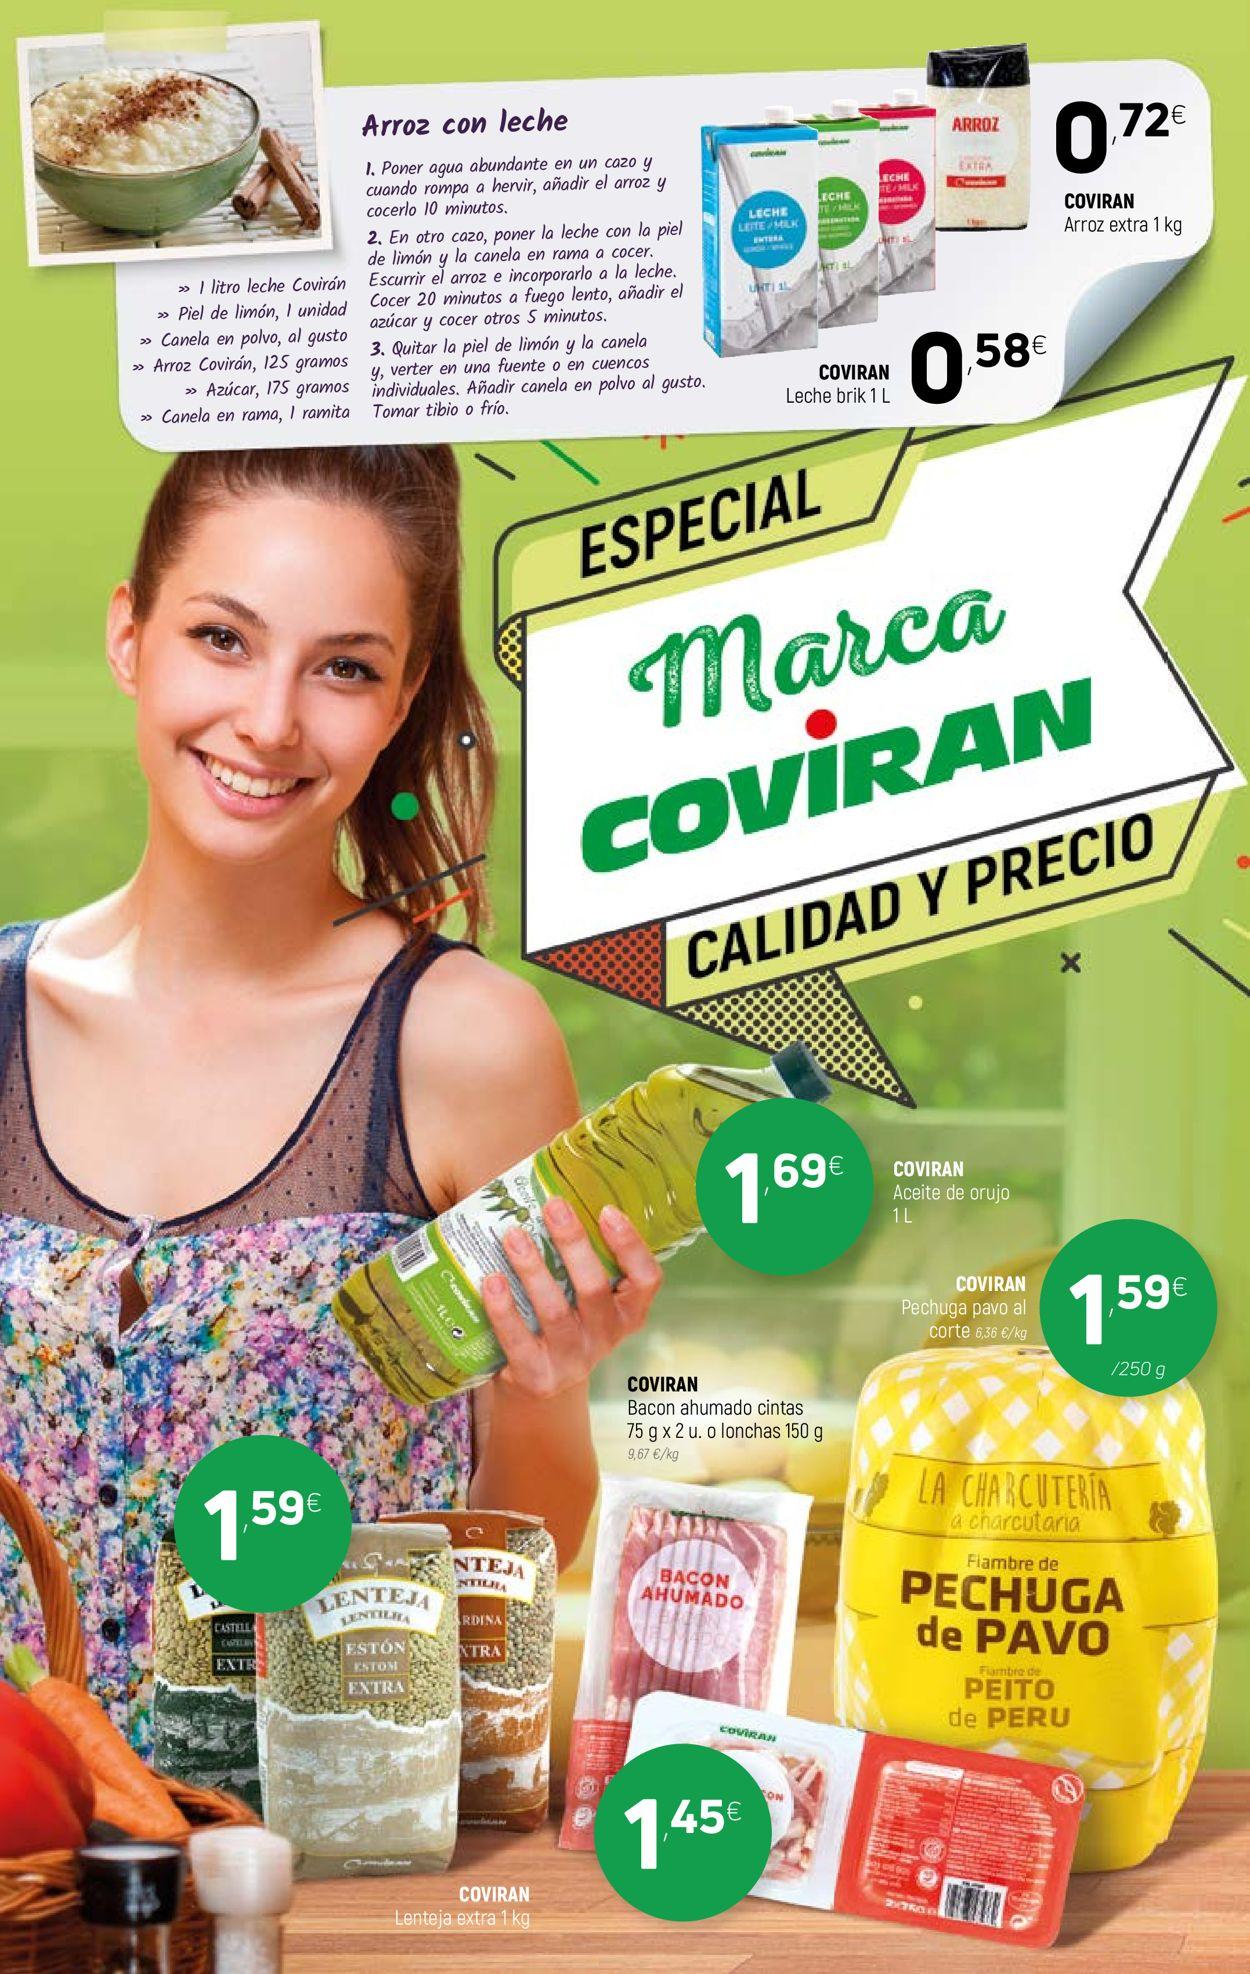 Coviran Folleto - 06.04-17.04.2021 (Página 8)